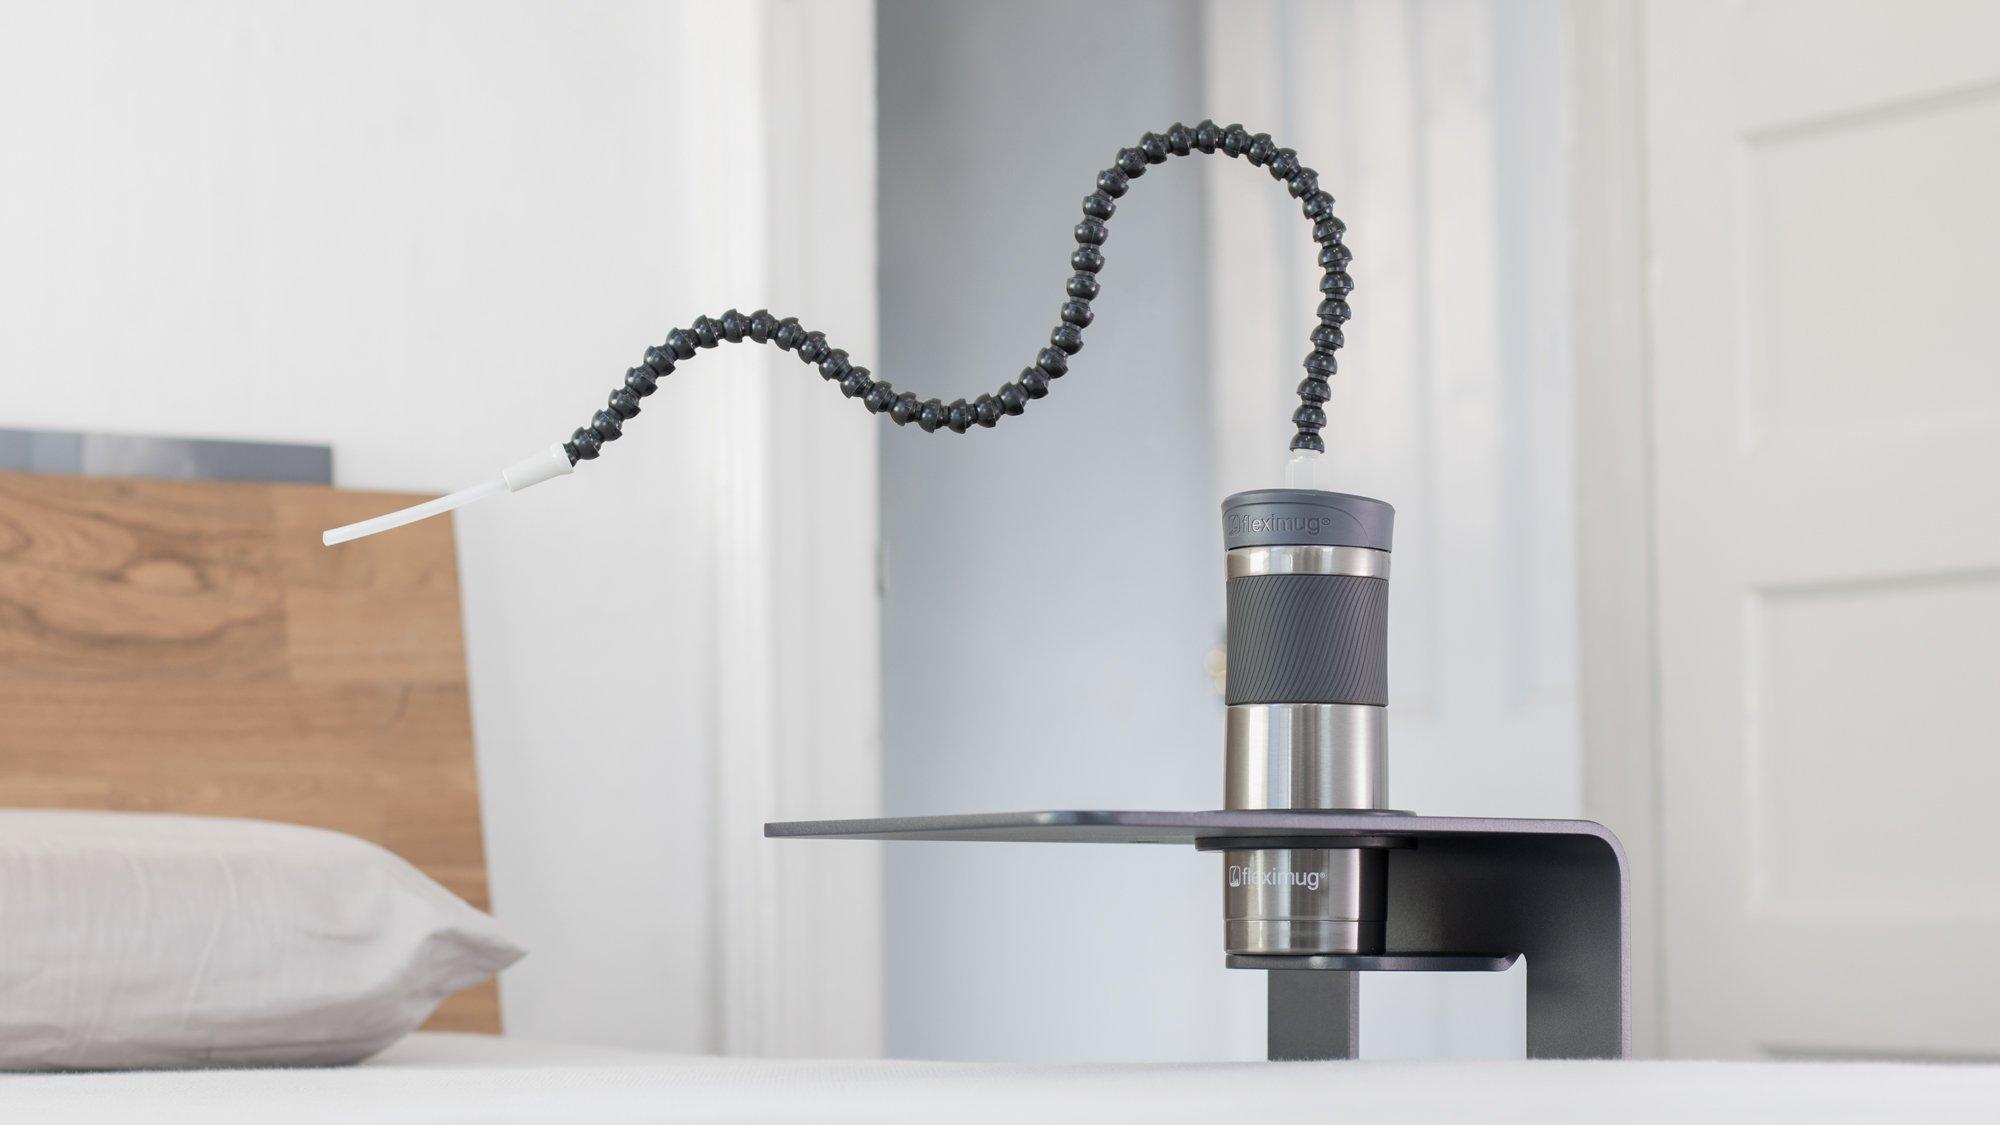 Fleximug & Flexistand - Hands Free Drinking System - Mug + Table (Combo) - Includes Fleximug with 36'' Straw by Fleximug